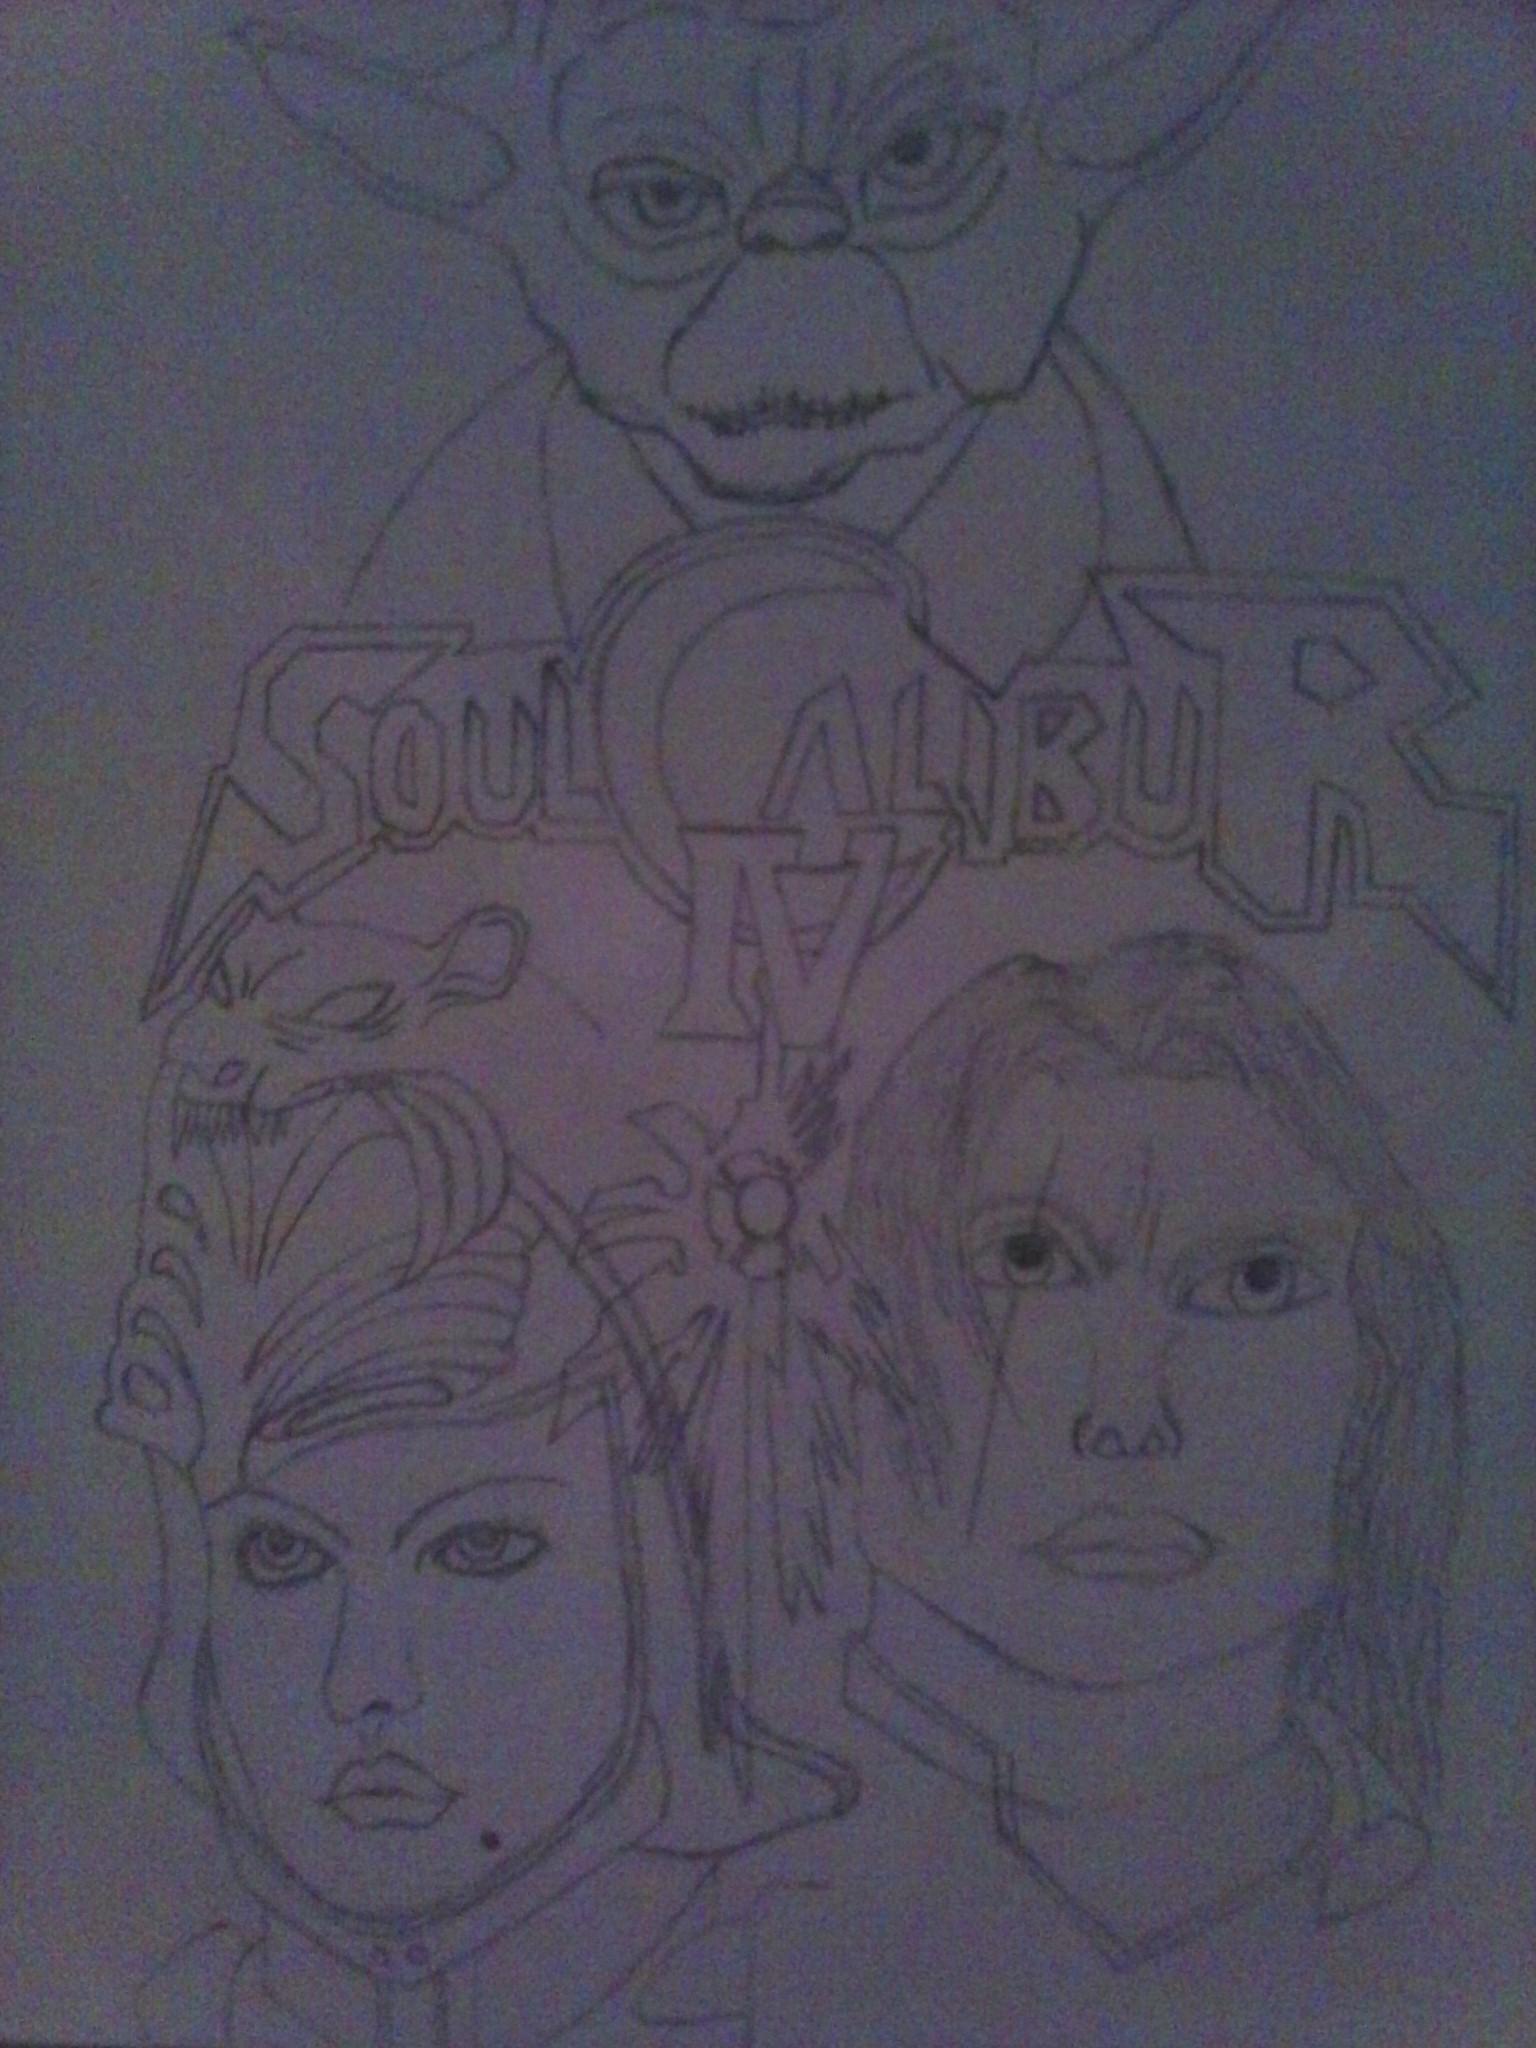 Soul calibur case drawing by SaiyanLink